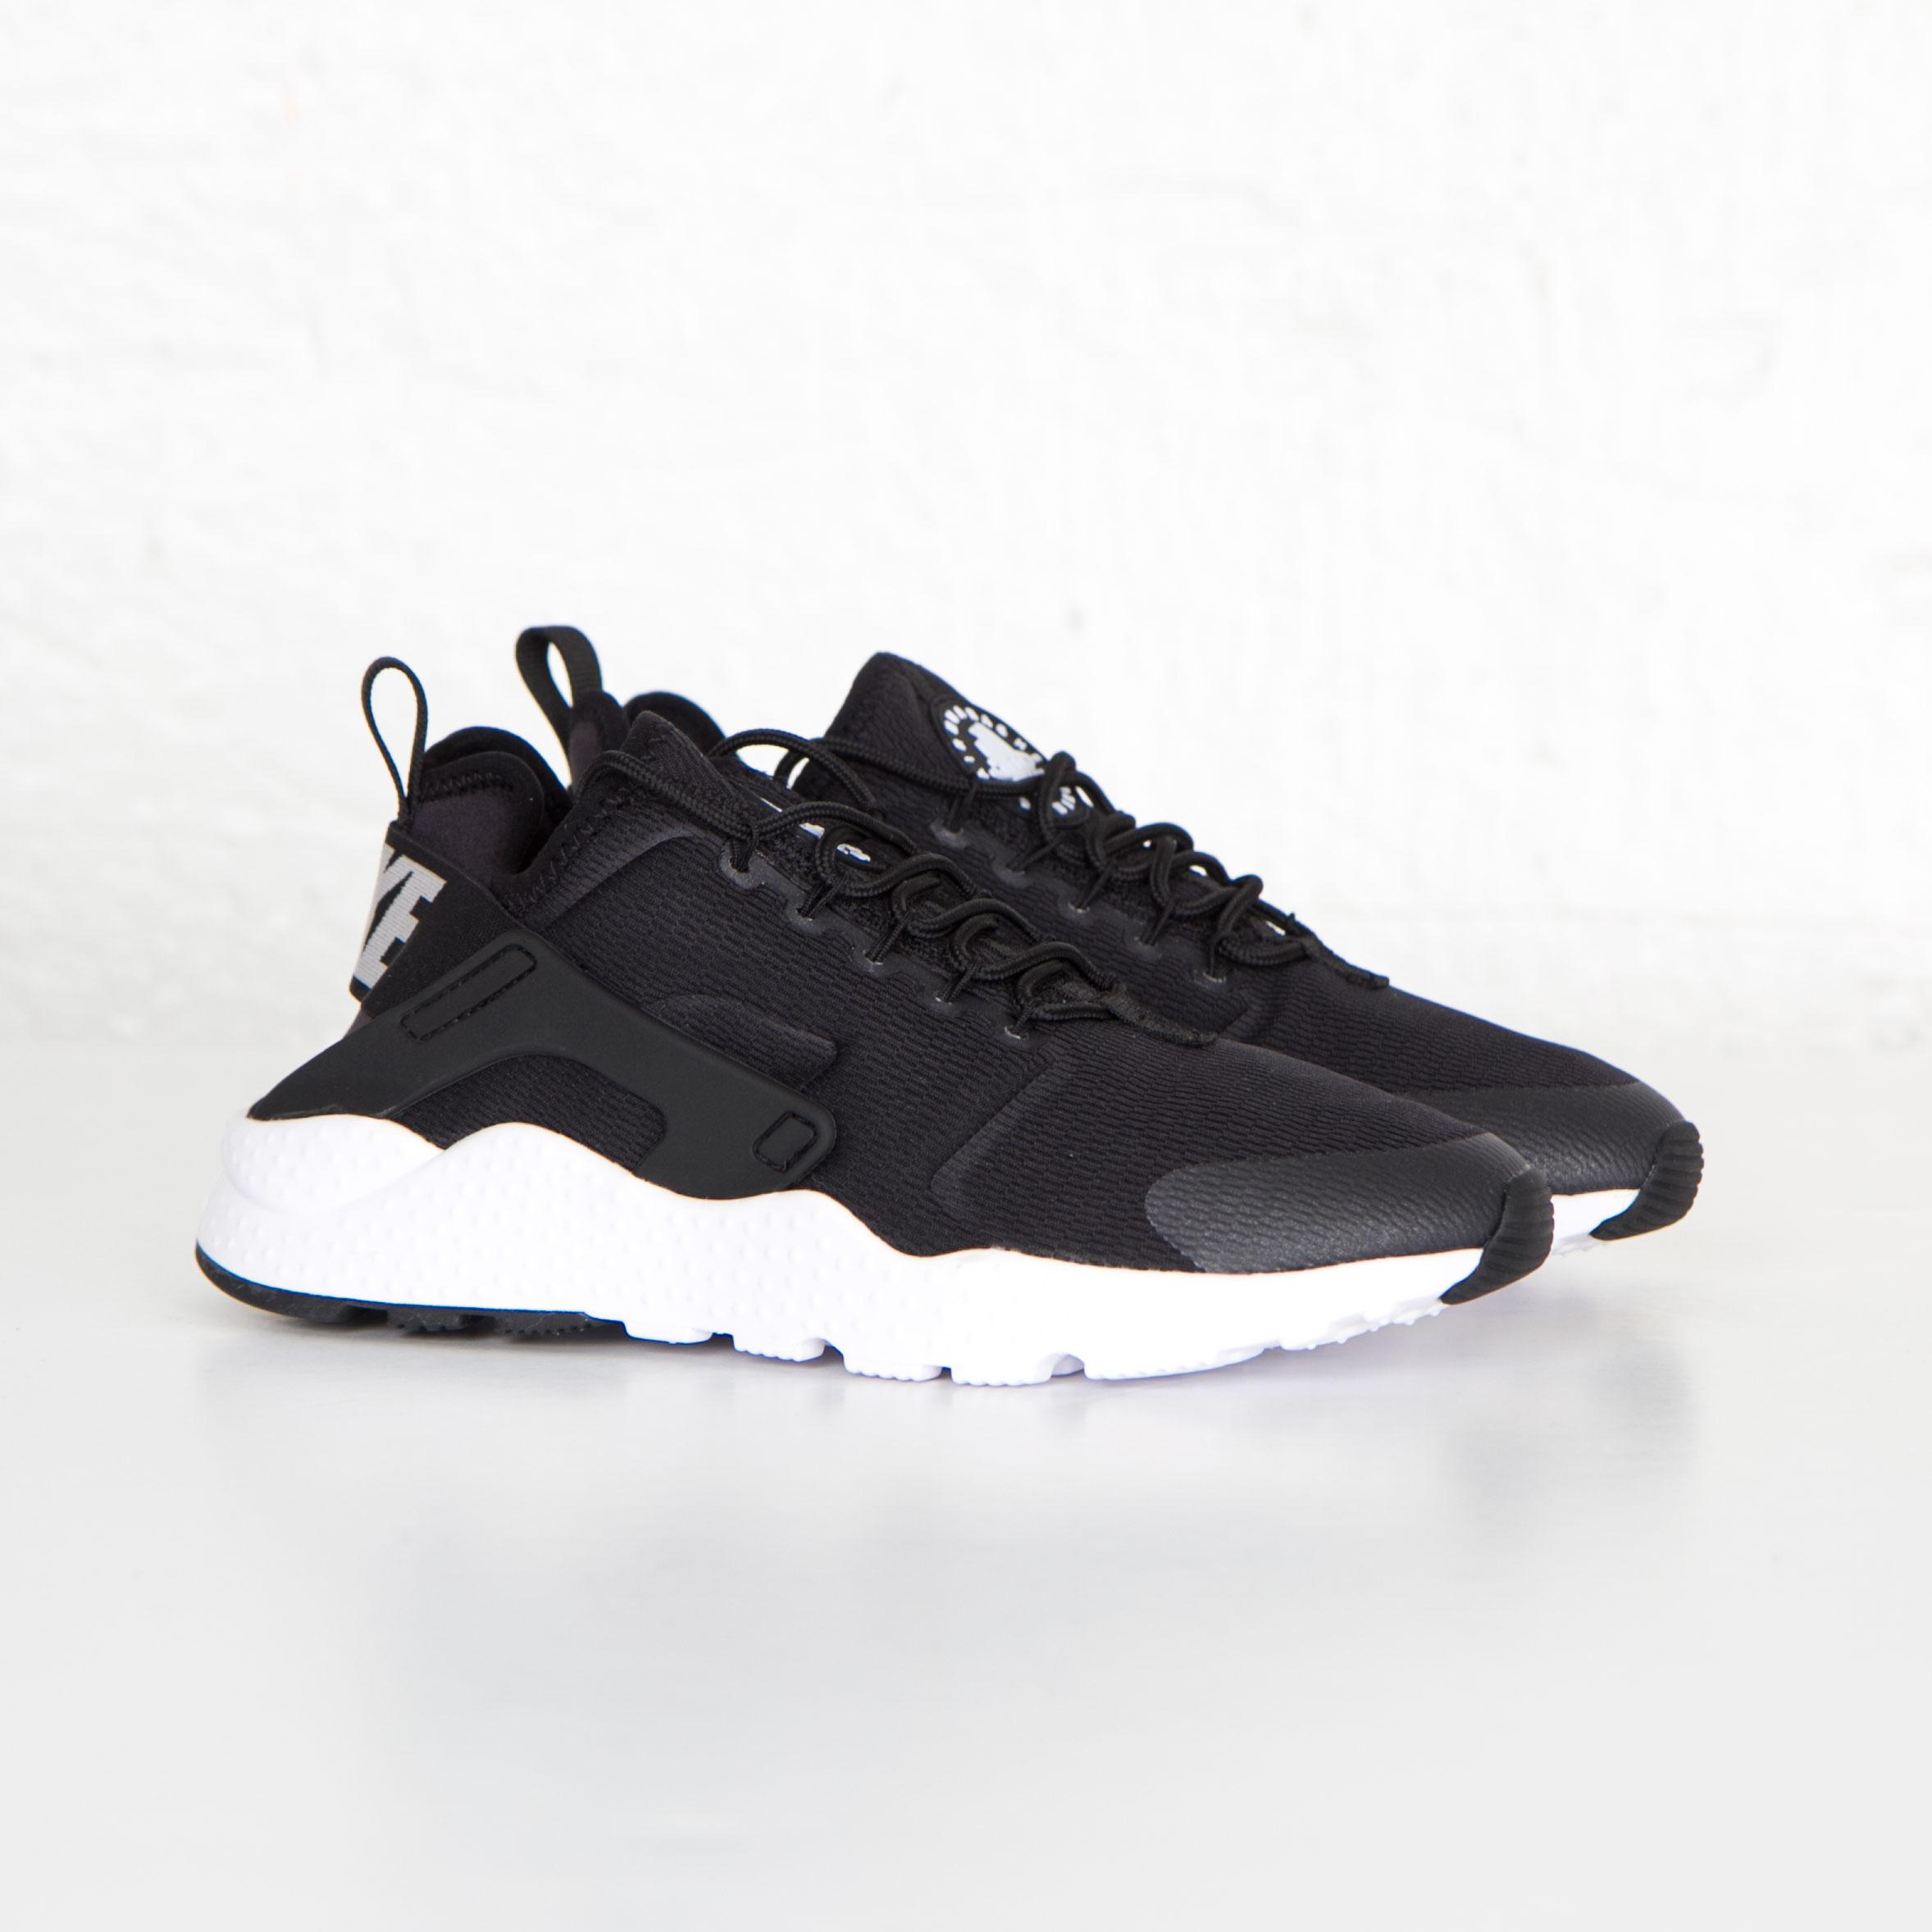 6b2d52af6c Nike W Air Huarache Run Ultra - 819151-001 - Sneakersnstuff ...